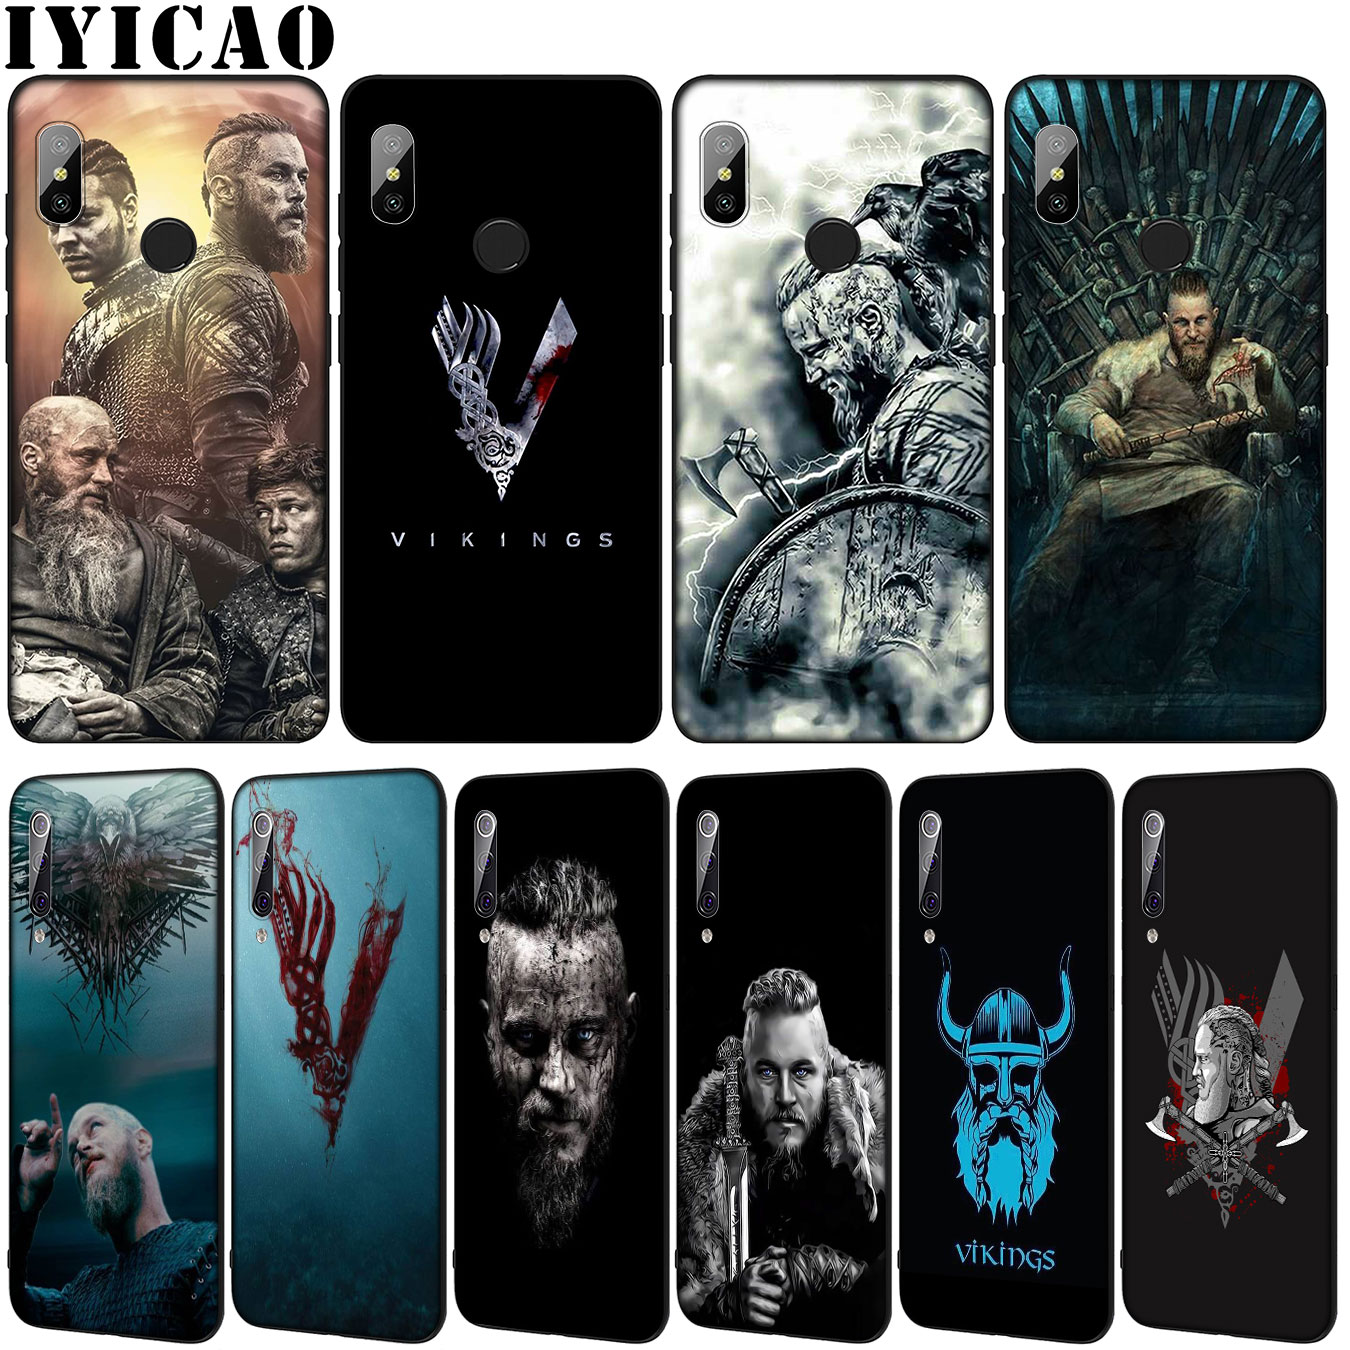 IYICAO vikingos TV muestra de silicona suave funda de teléfono para Xiaomi mi 10 9 9T A3 Pro 8 SE A2 Lite A1 6 CC9 CC9E teléfono móvil f1 mi 10